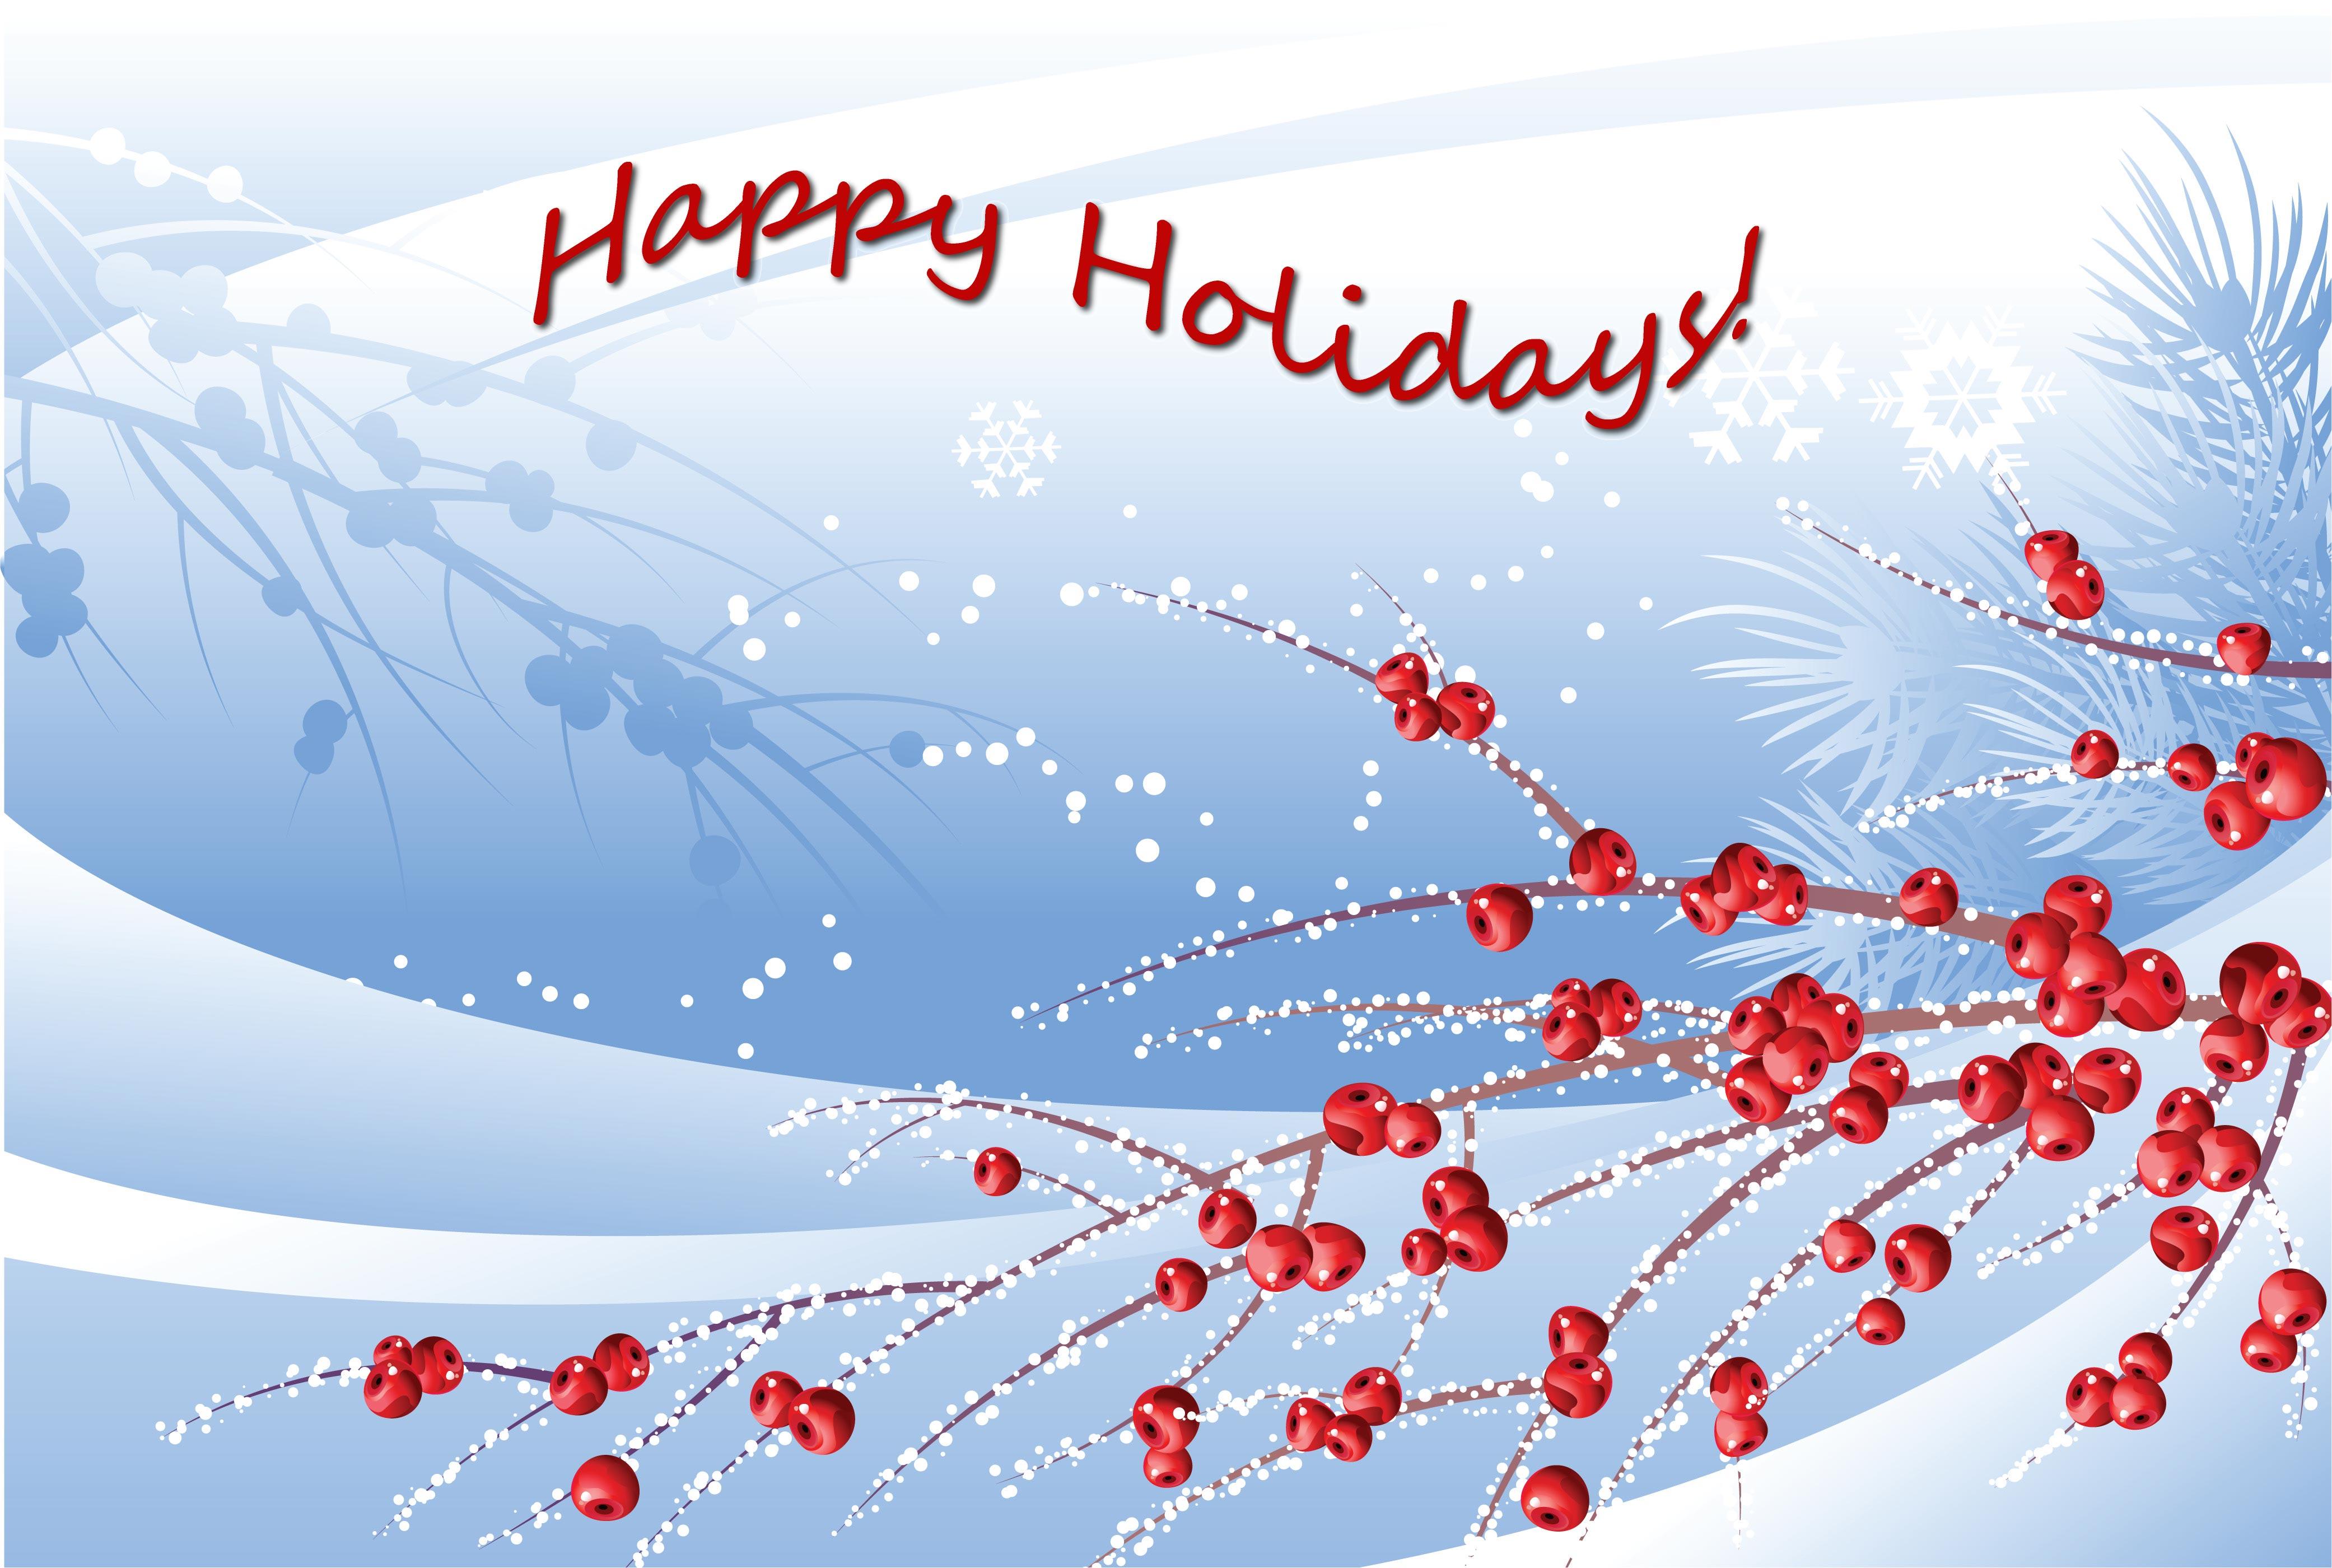 Happy Holidays Wallpapers 7J4DK81 WallpapersExpertcom 4164x2800